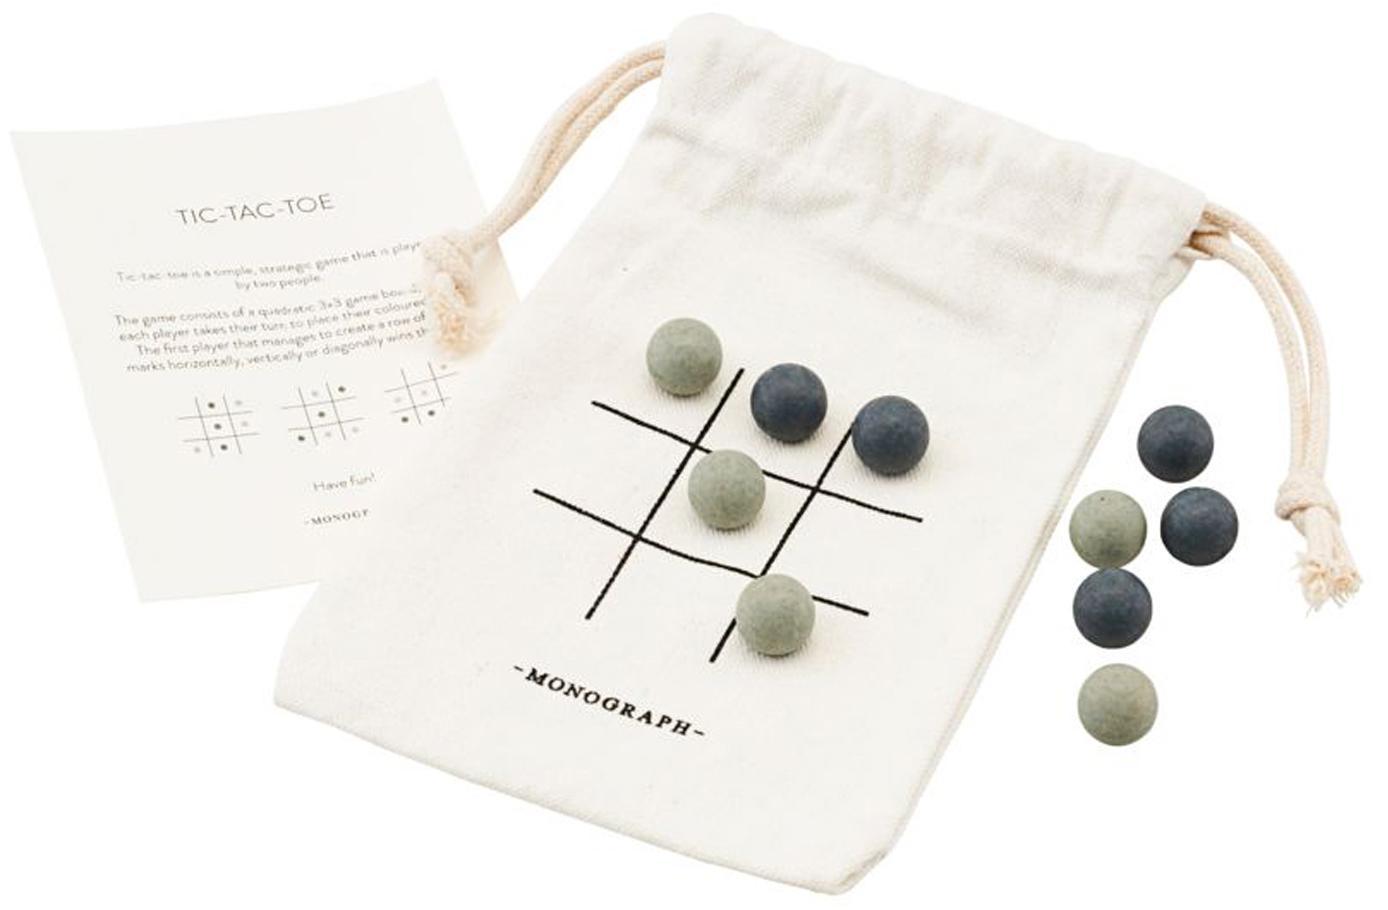 Bordspel Tic Tac Toe, 10-delig, Textiel, hout, Multicolour, 10 x 12 cm